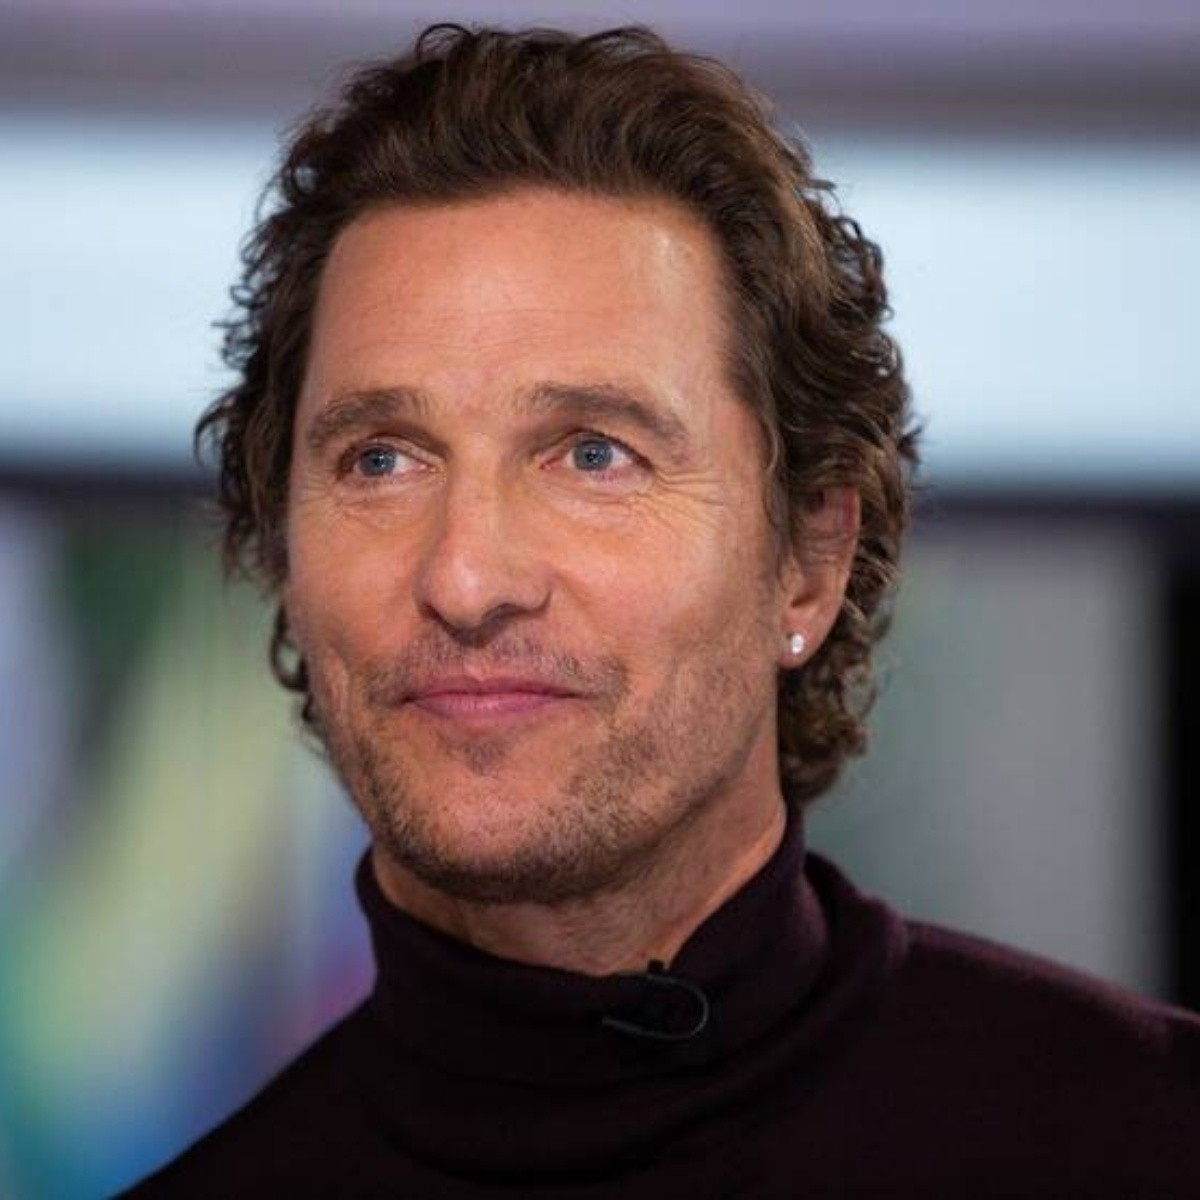 ¿Cuánto mide Matthew McConaughey? Matthew_mcconaughey.jpg_423682103